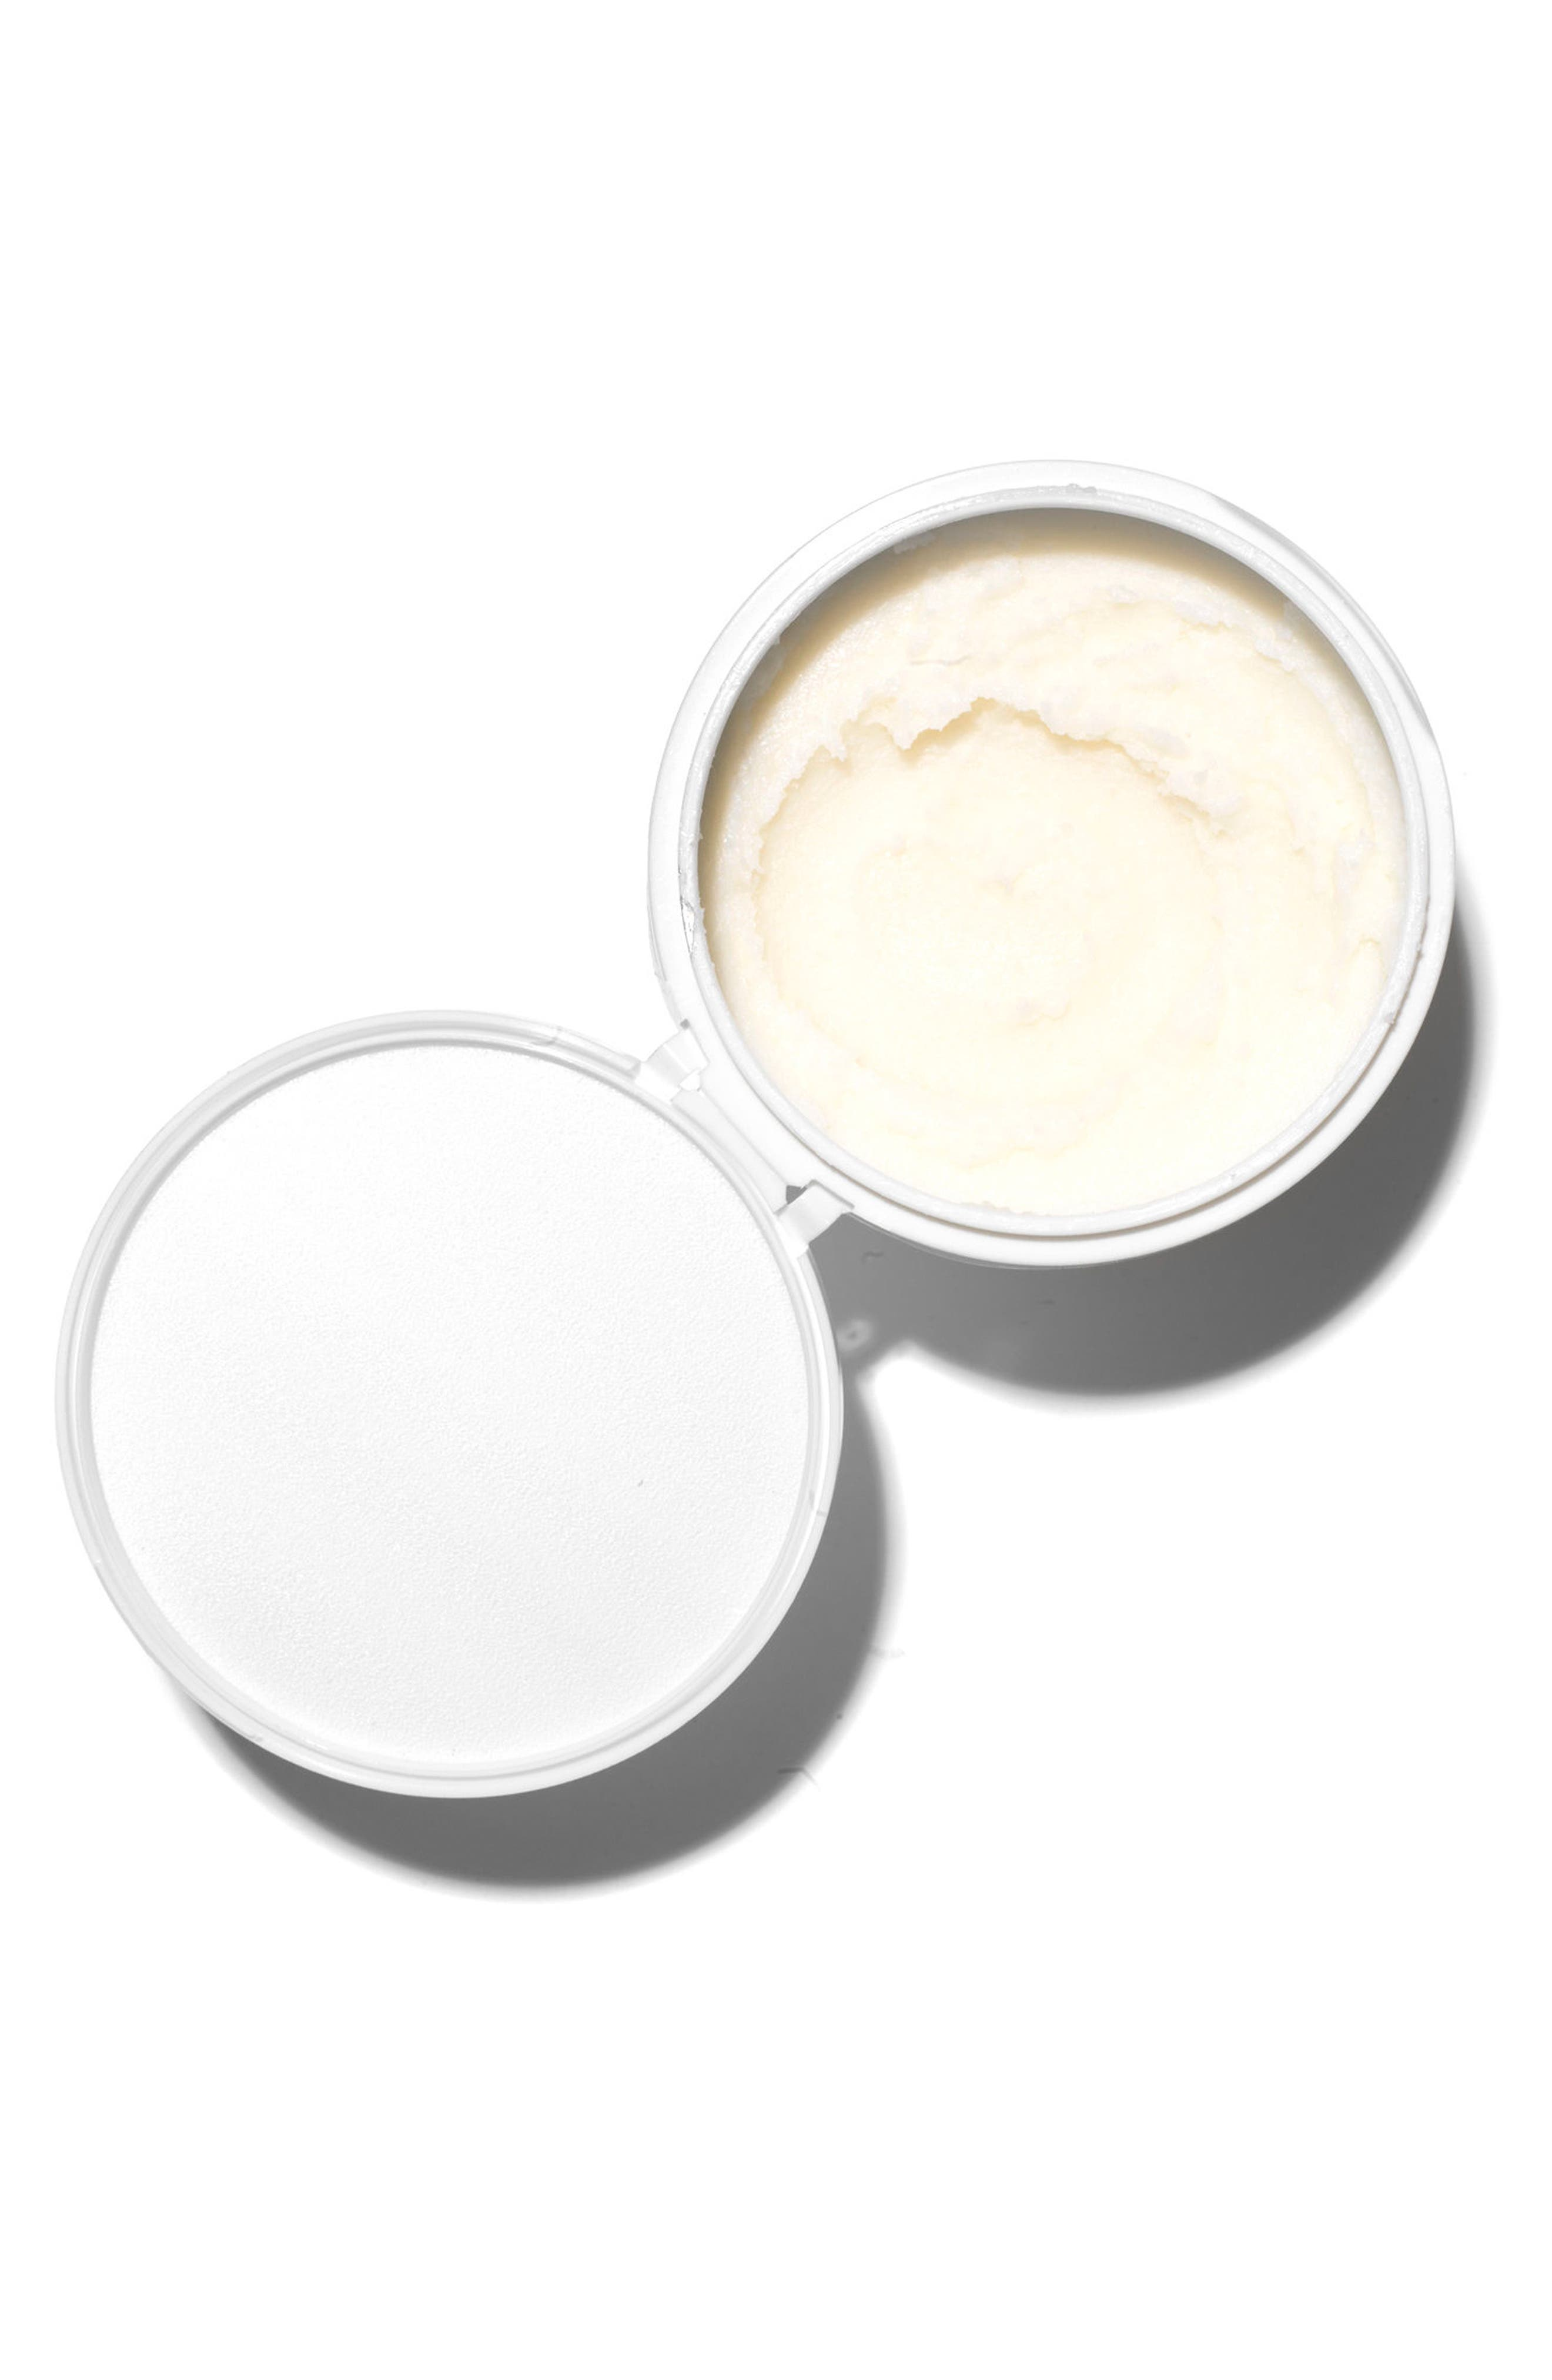 SPACE.NK.apothecary REN Atlantic Kelp and Magnesium Salt Anti-Fatigue Exfoliating Body Scrub,                             Alternate thumbnail 2, color,                             No Color